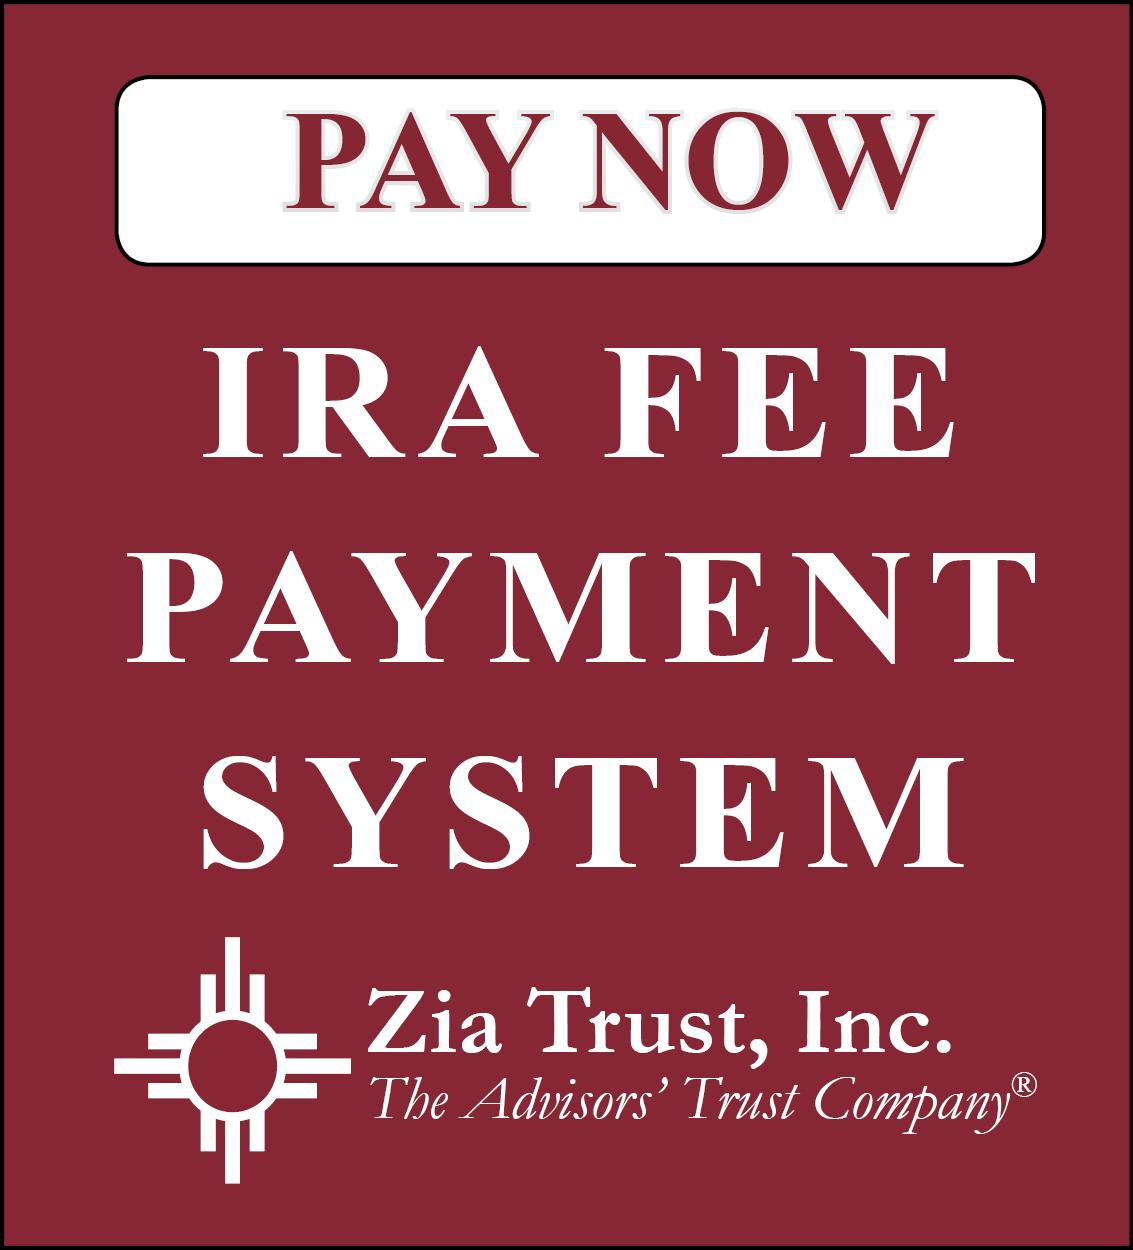 Self-Directed IRAs - Zia Trust Inc